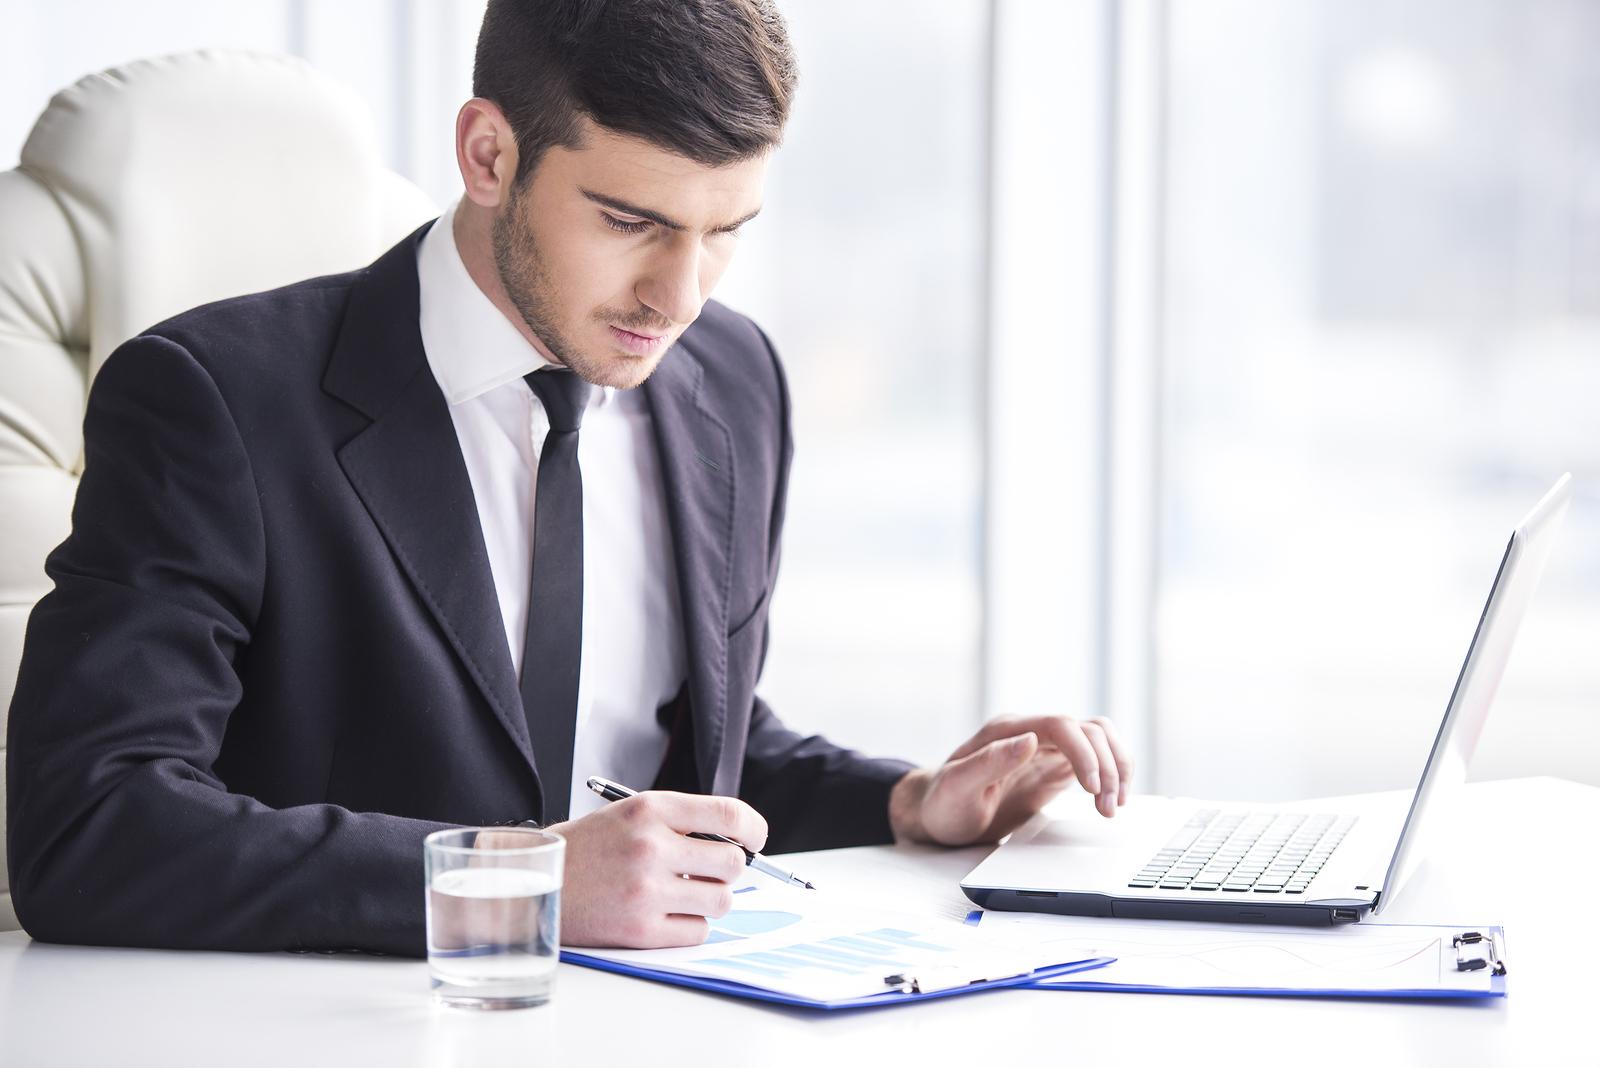 https://i0.wp.com/www.caproasia.com/wp-content/uploads/2015/08/Professional-Banker-3.jpg